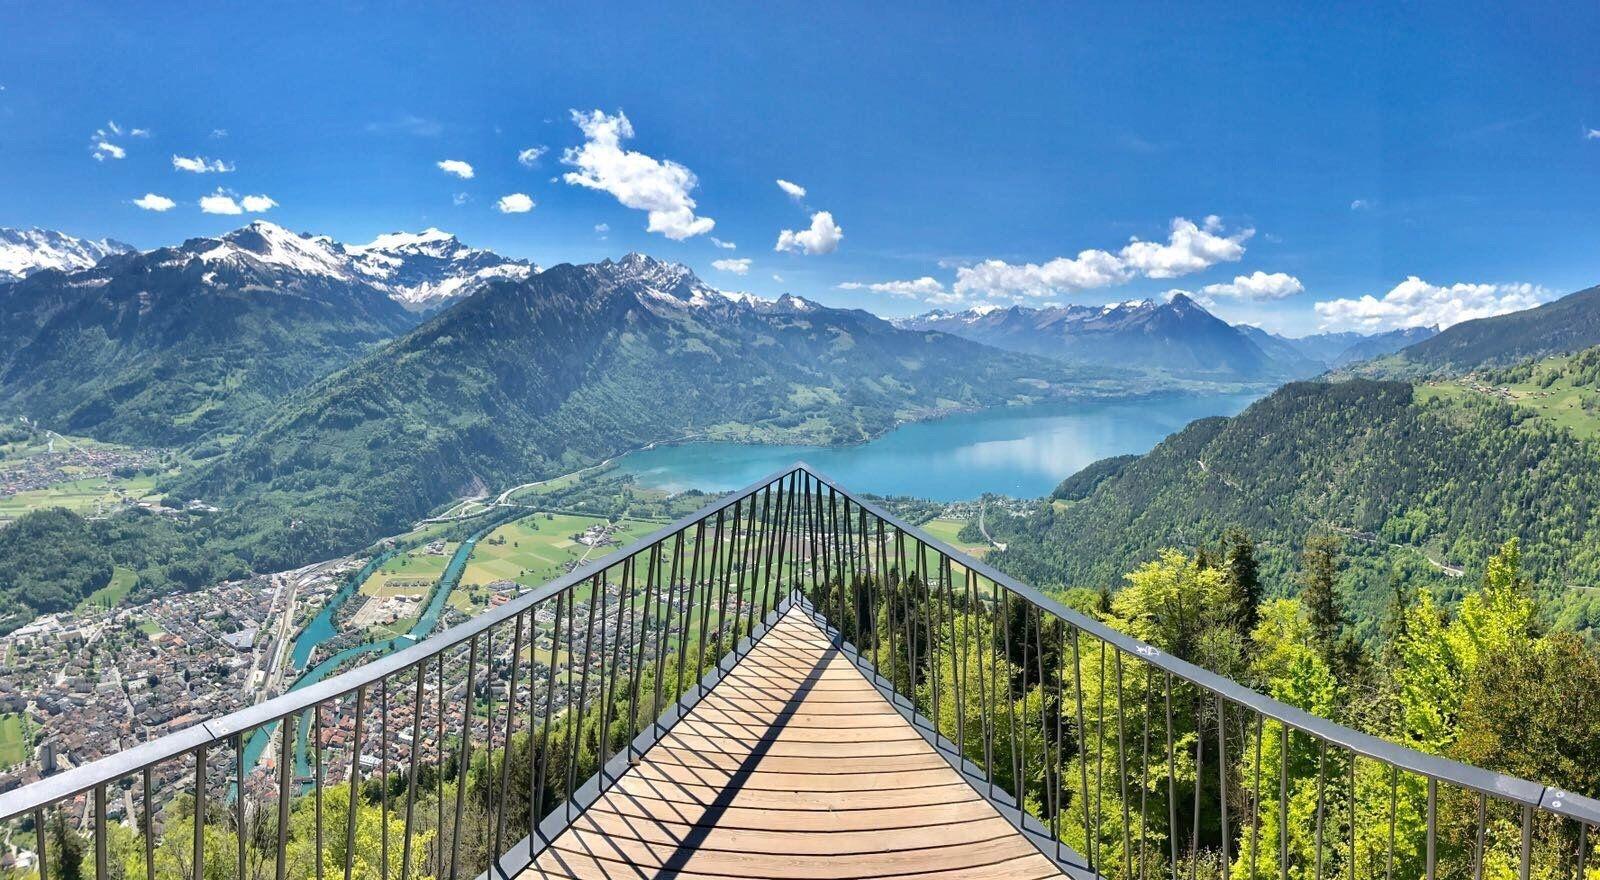 سويسرا انترلاكن اهم الاماكن السياحيه جبل هاردر كولم انترلاكن